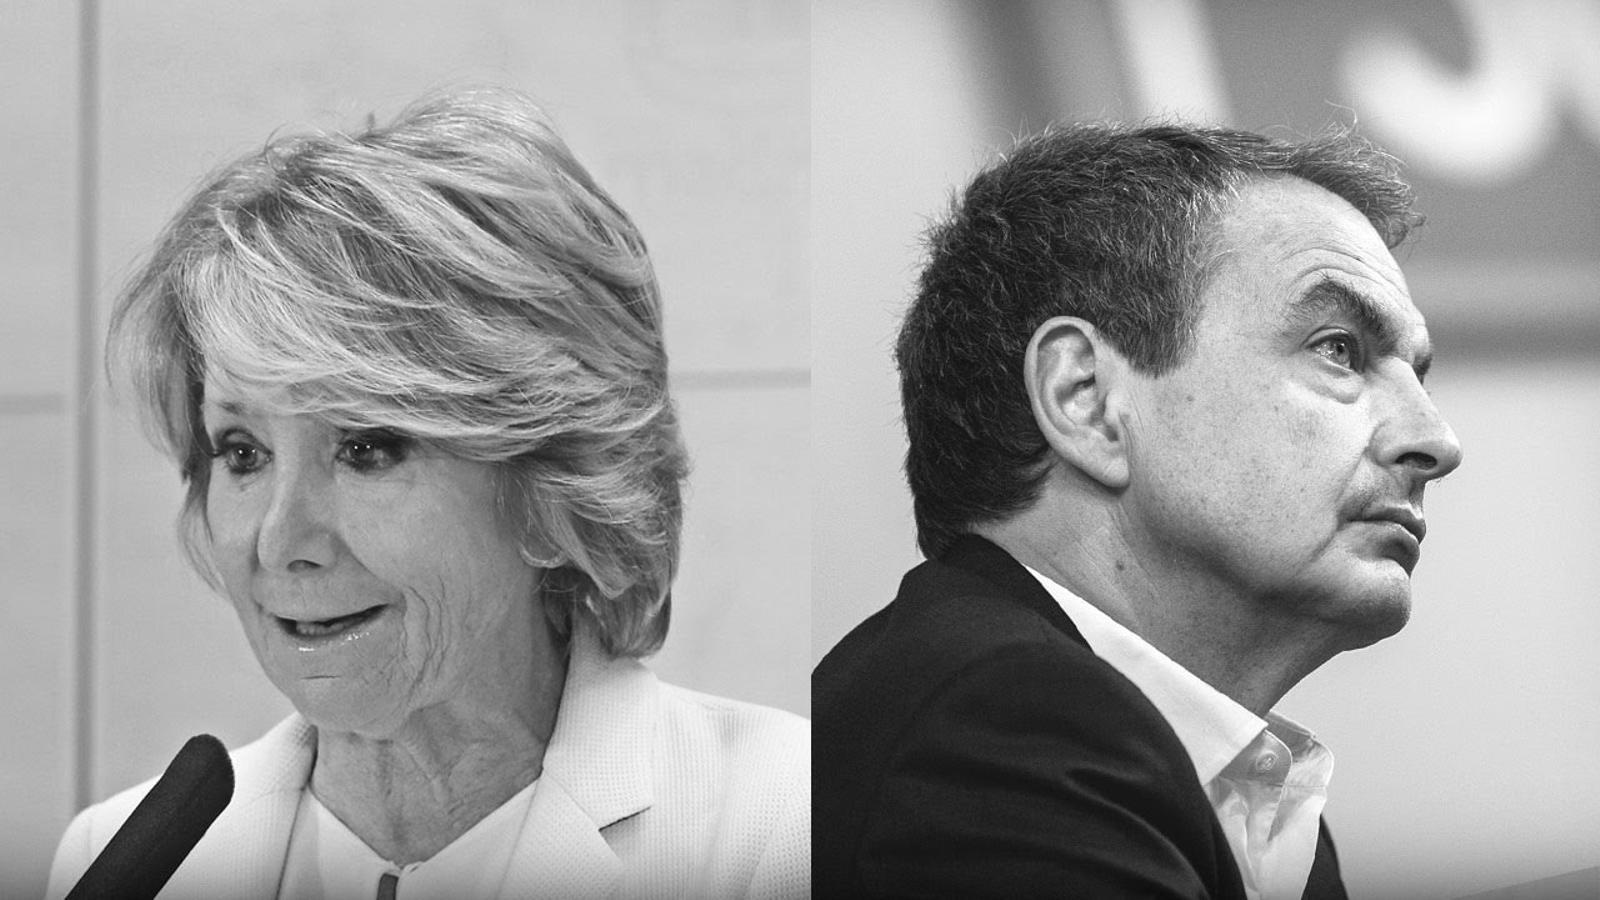 L'anàlisi d'Antoni Bassas: 'Aguirre, Zapatero i la desconnexió de la gent'